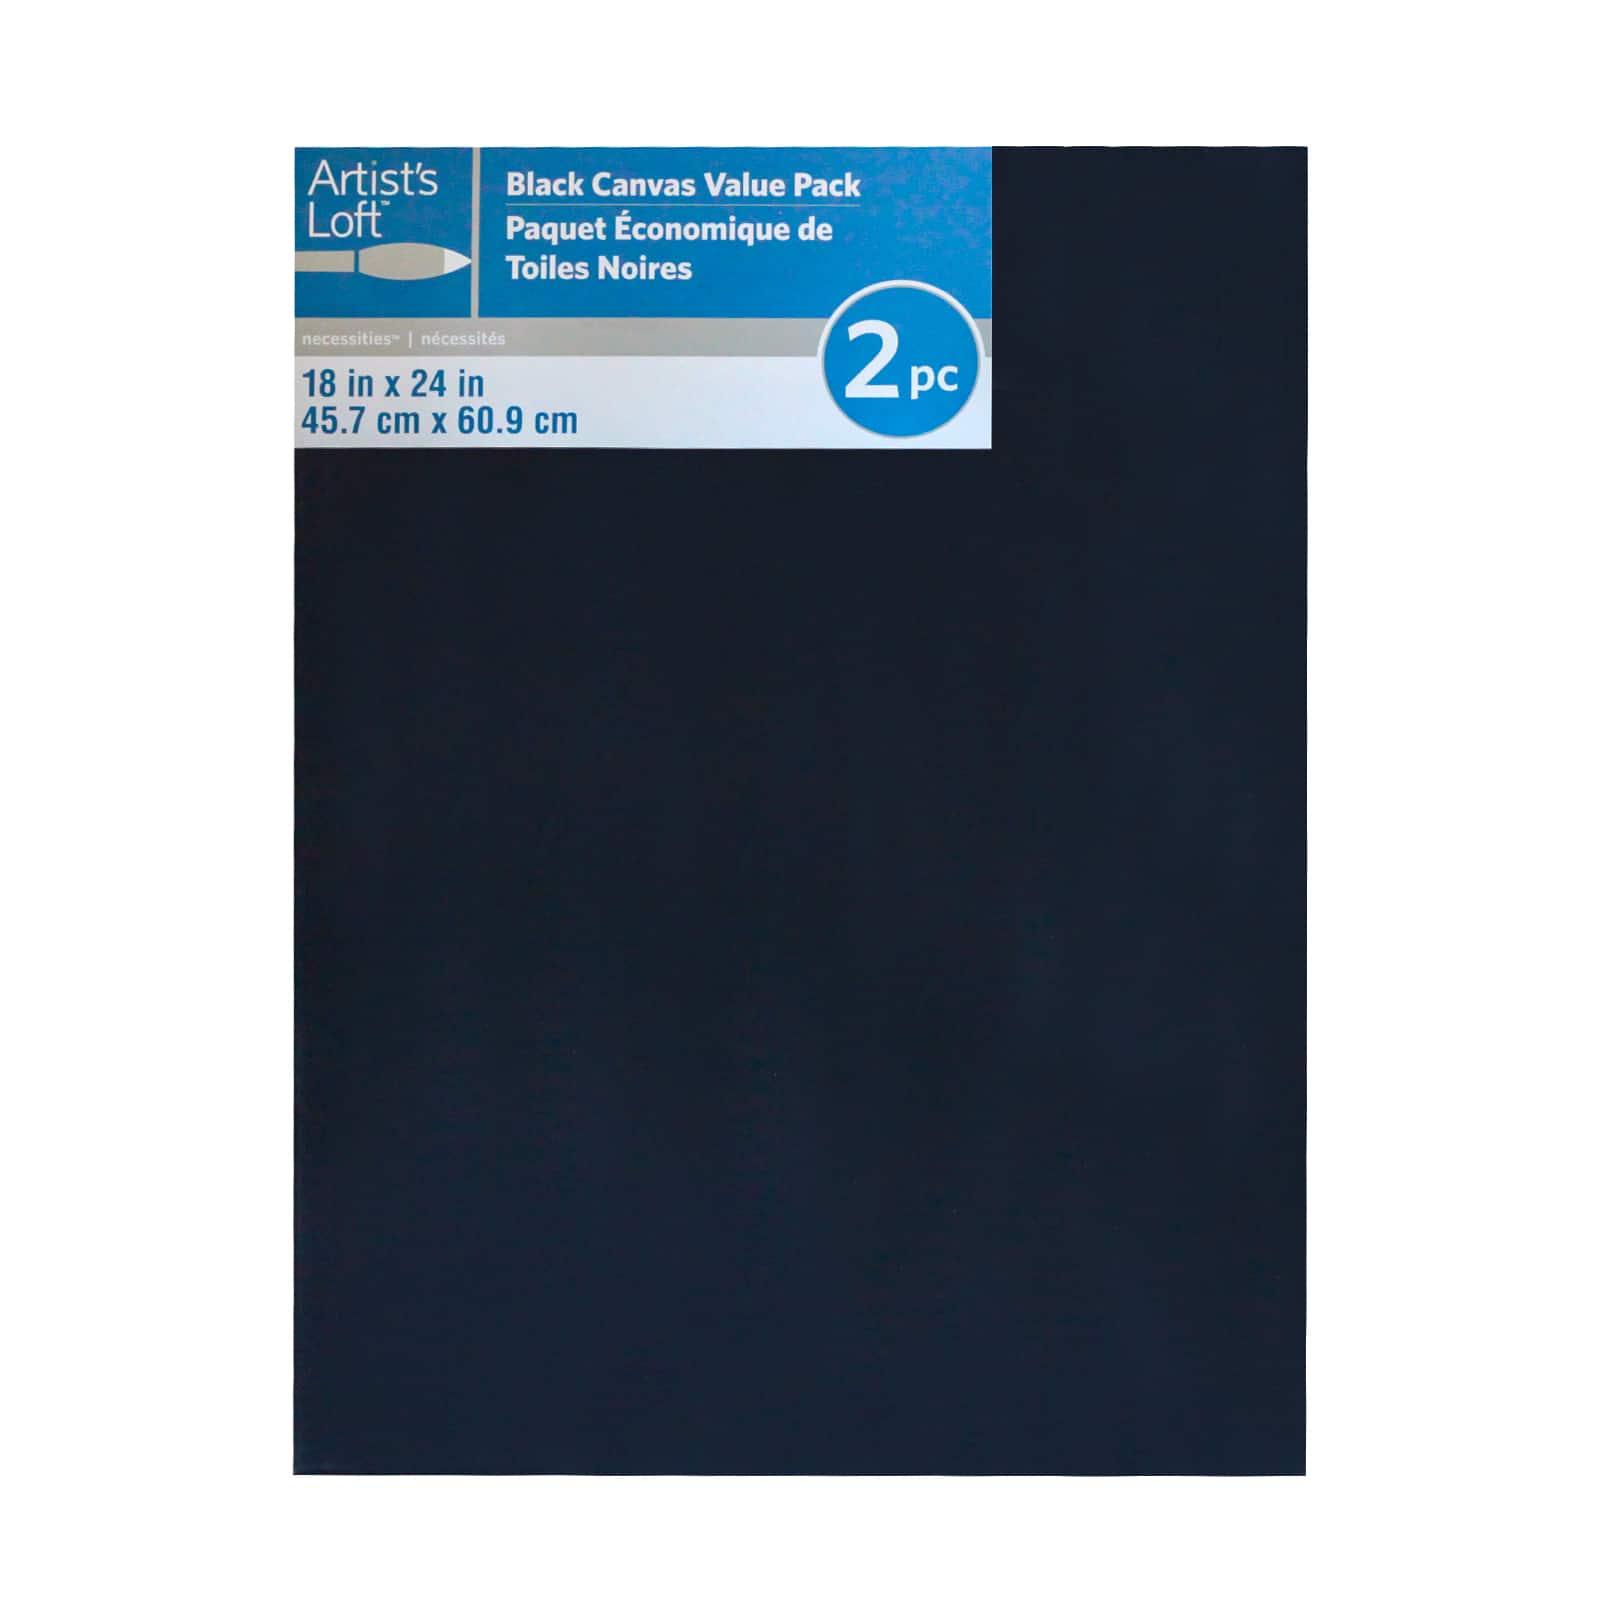 SC2052 Rhinestone Charm Pendant Antique Silver Tone with 23 Blue Rhinestones